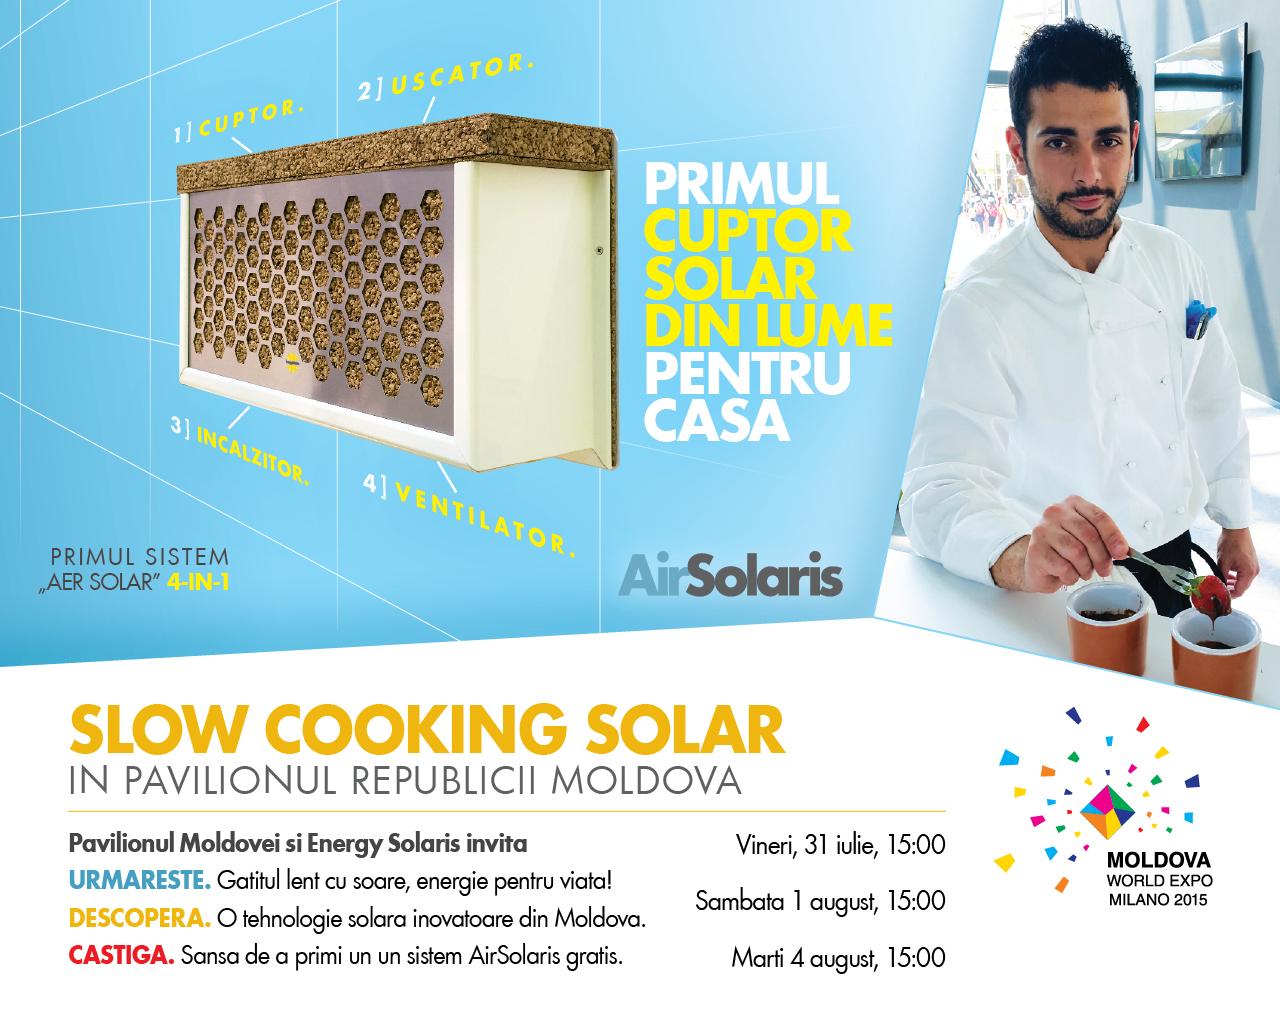 Solar_Slow_Cooking_Moldova_Pavilion_Ro_v2